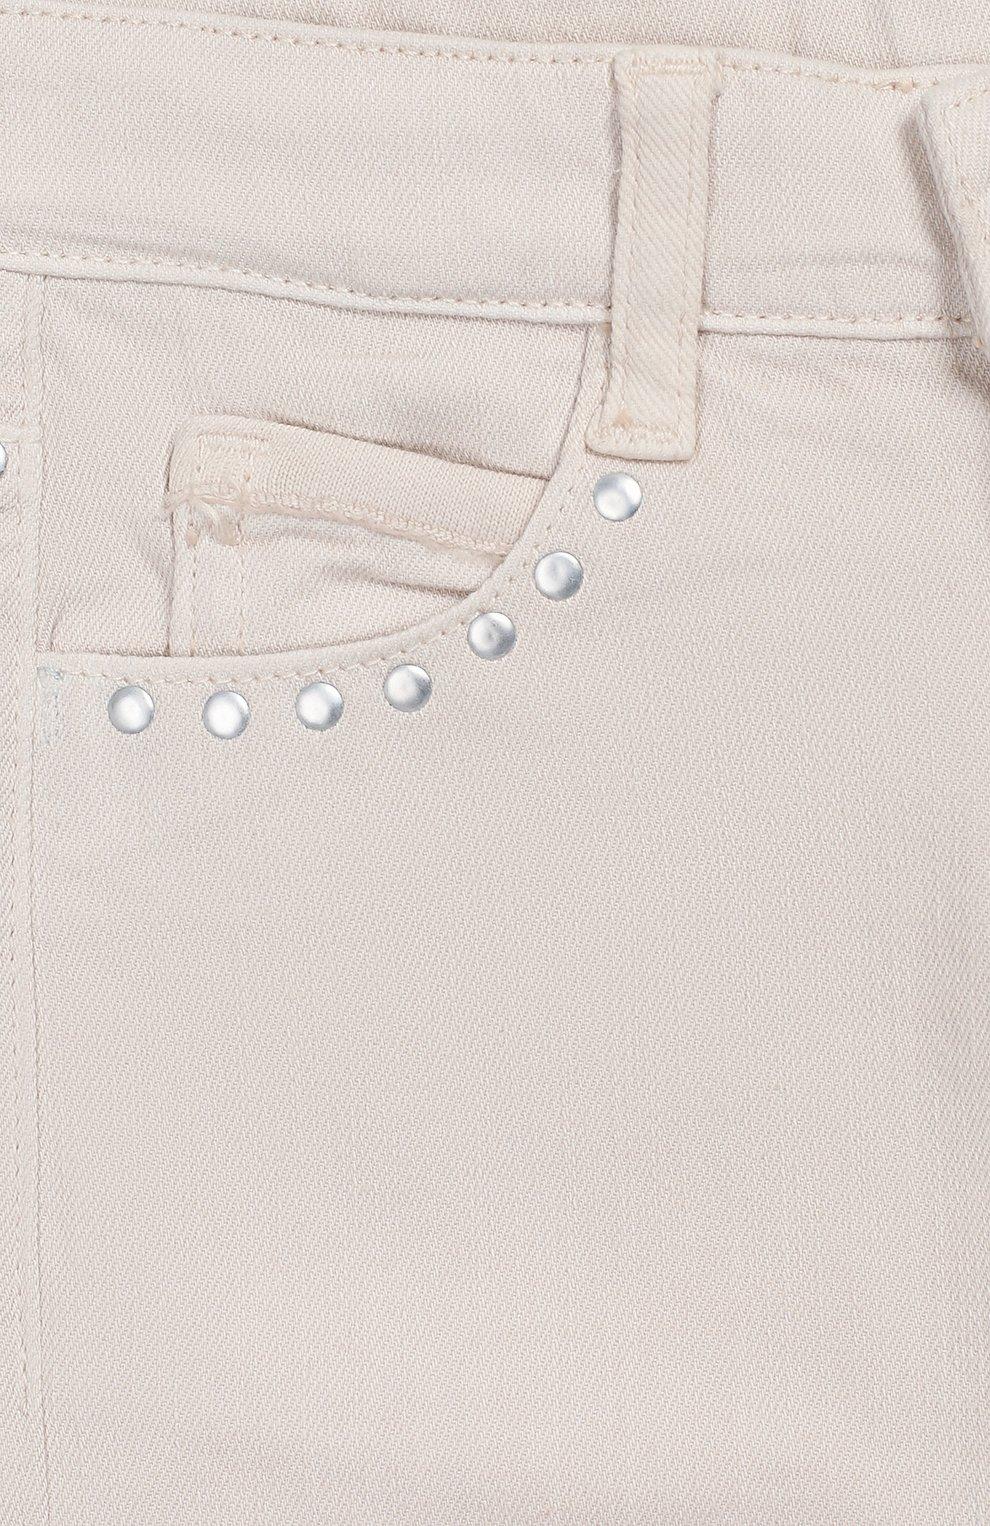 Детские джинсы DOUUOD бежевого цвета, арт. 20E/U/JR/PA01/1048/10A-14A   Фото 3